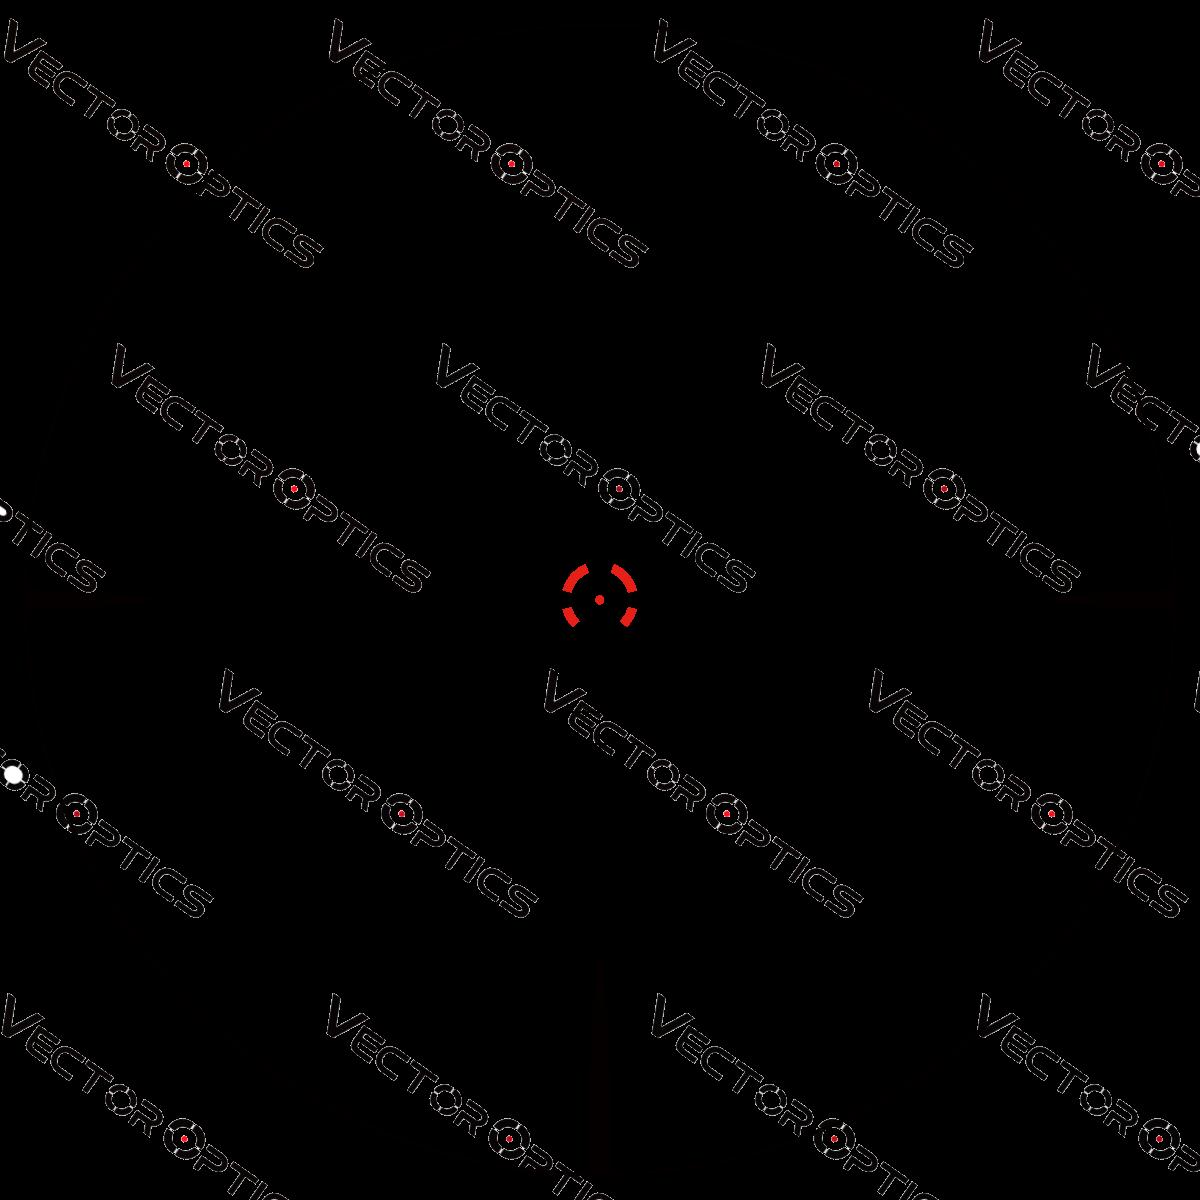 Constantine 1-10x24 SFP Riflescope dot sight